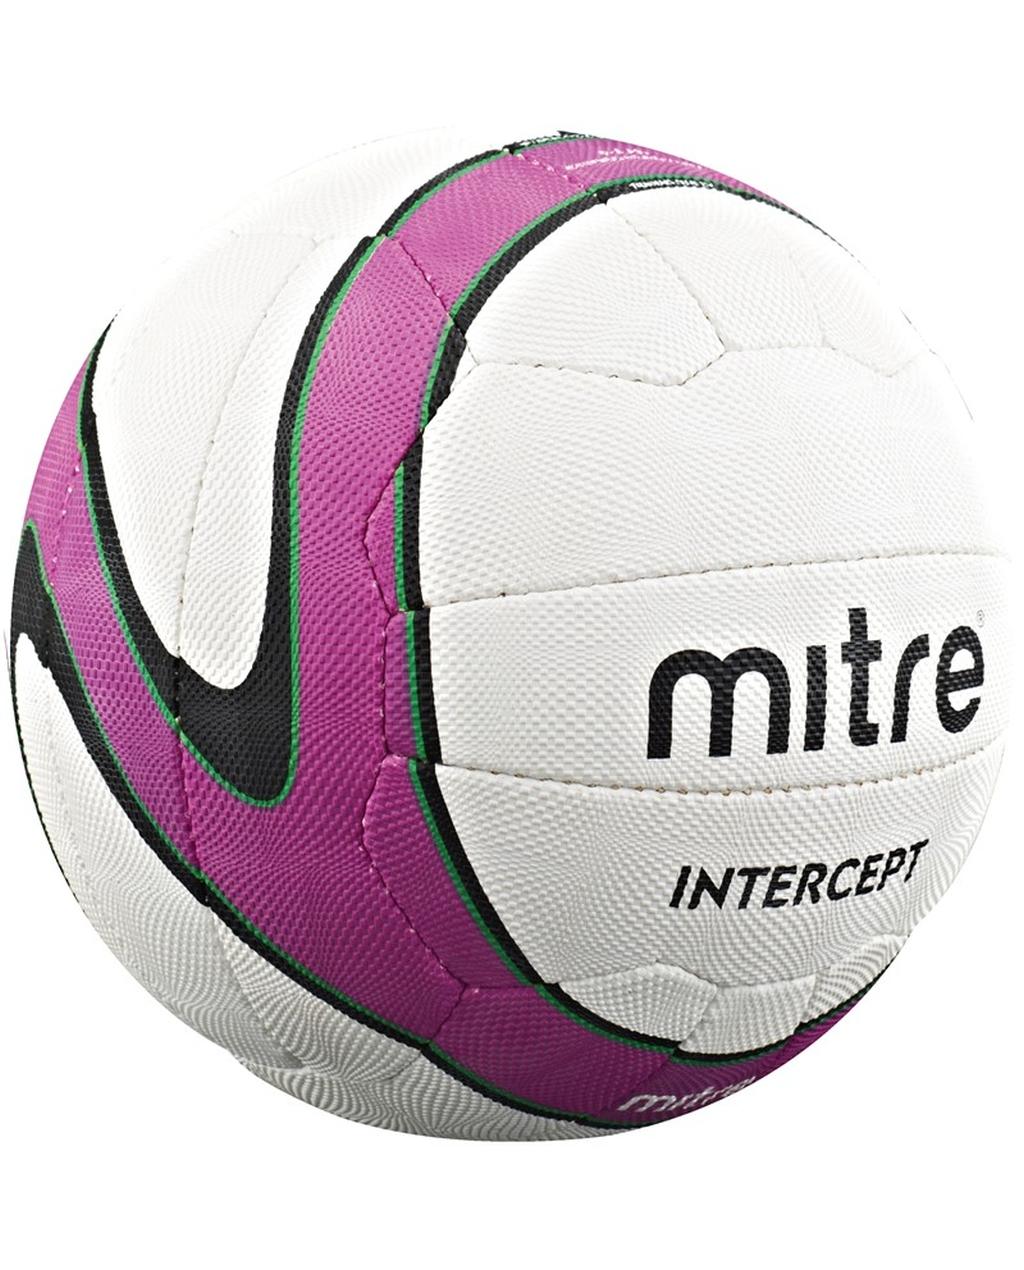 Mitre Intercept Netball Size 4